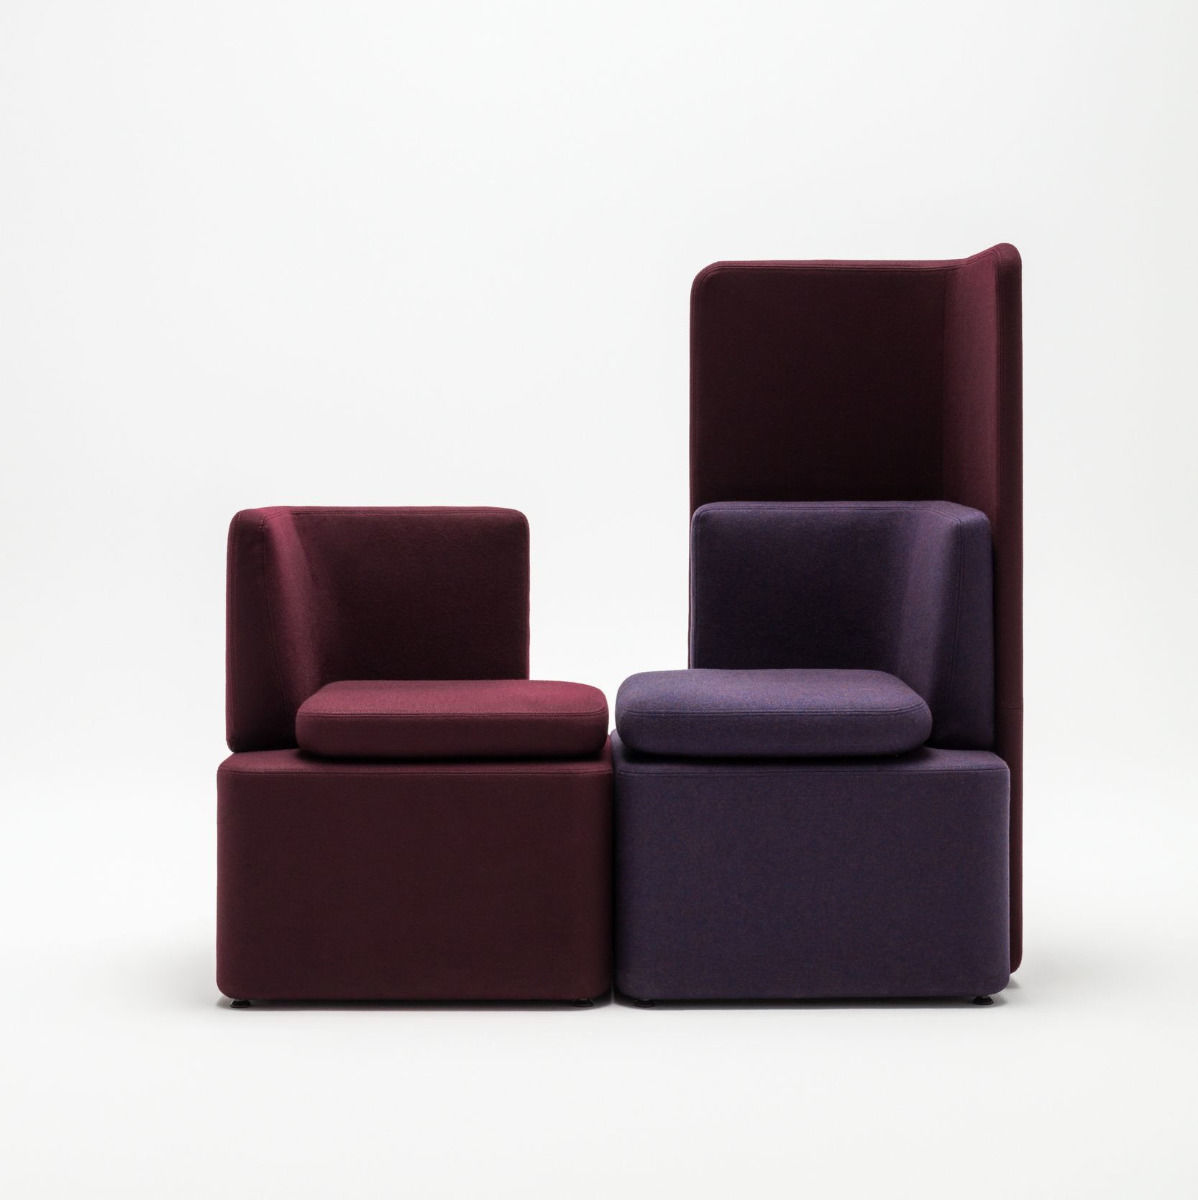 empfangstheken sitzmoebel studiomoebel violett blau rot